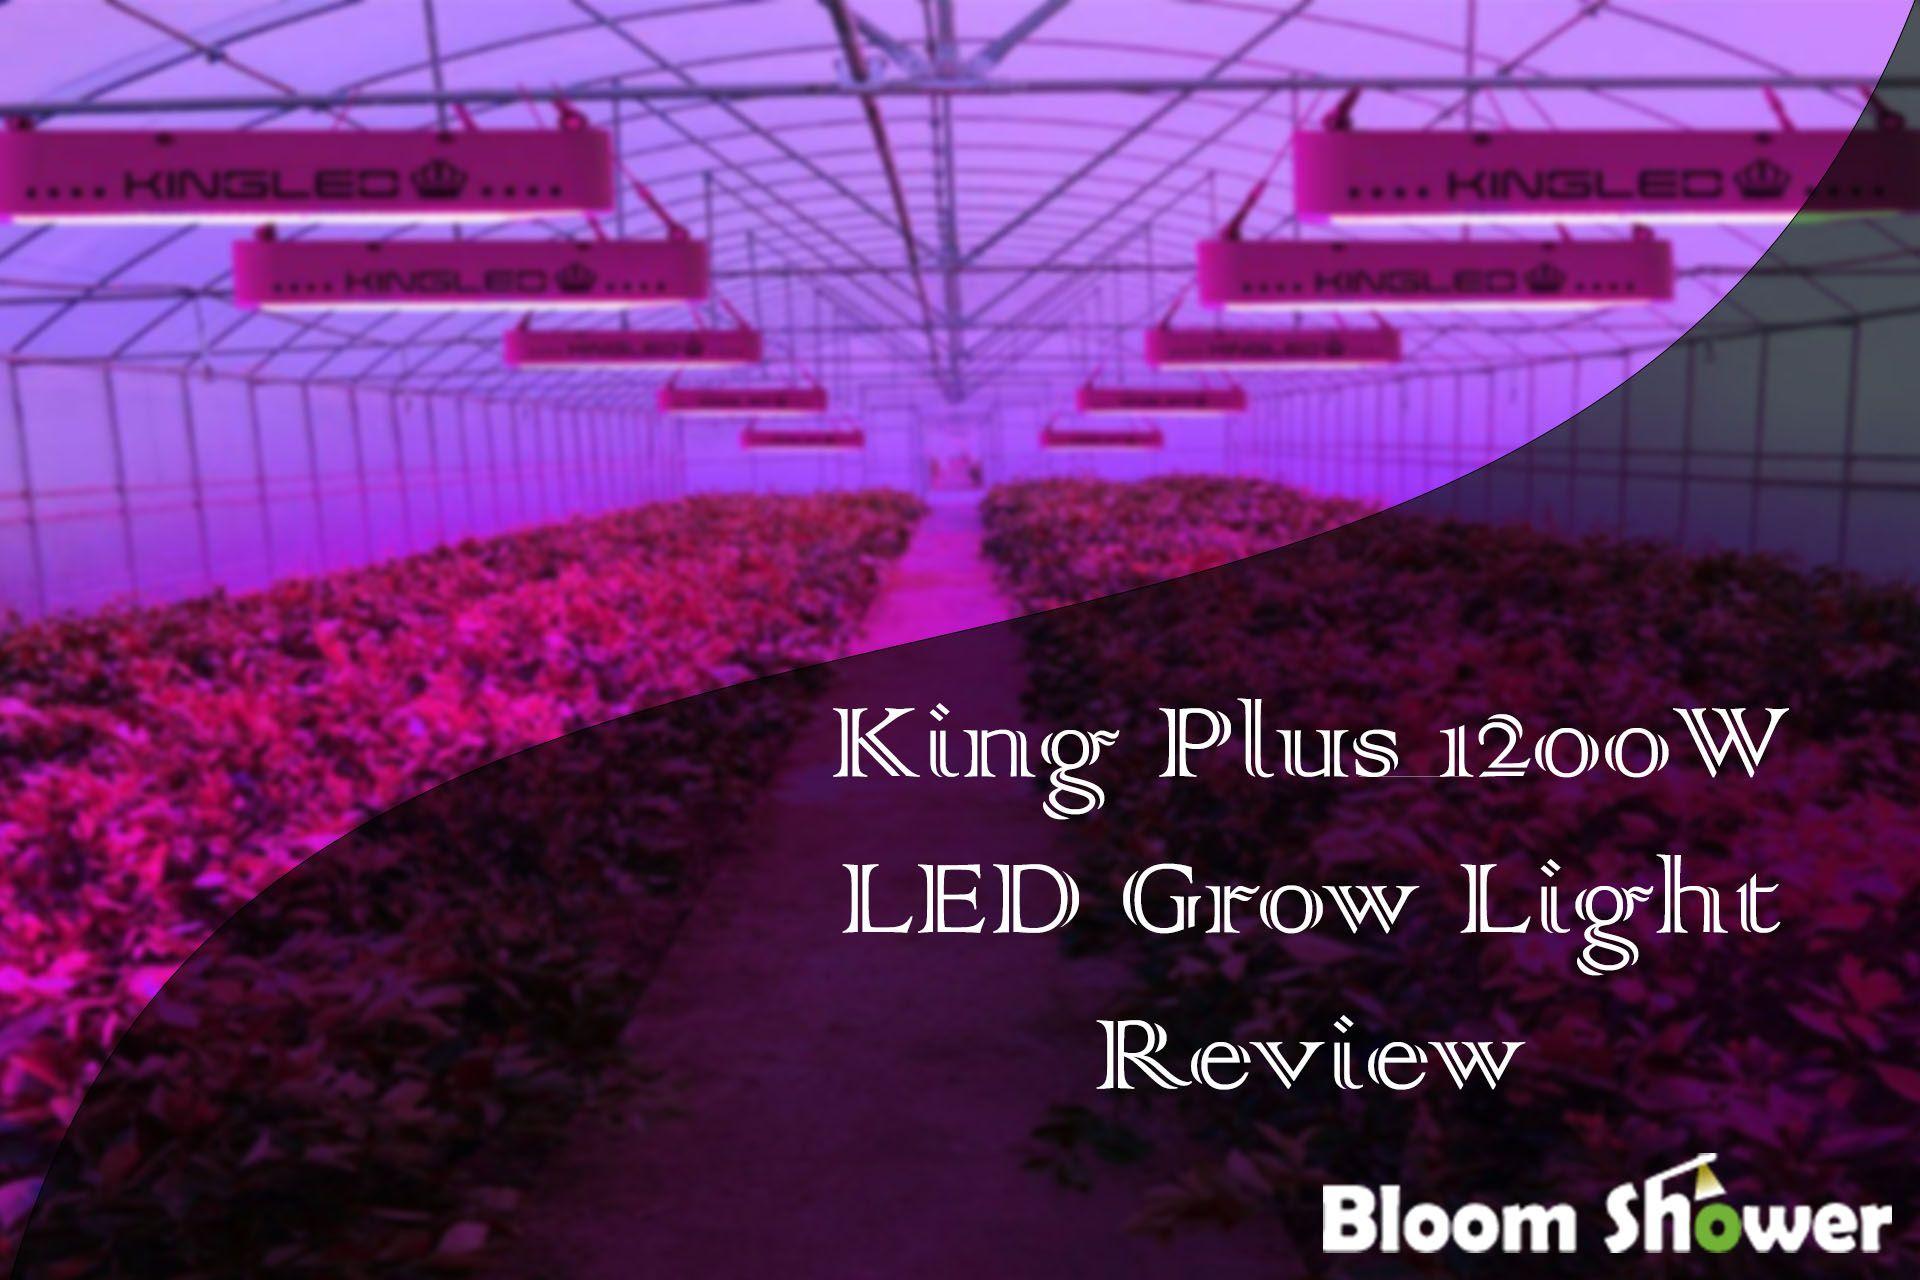 King Plus 1200w Led Review Led Grow Lights Grow Lights Led Grow